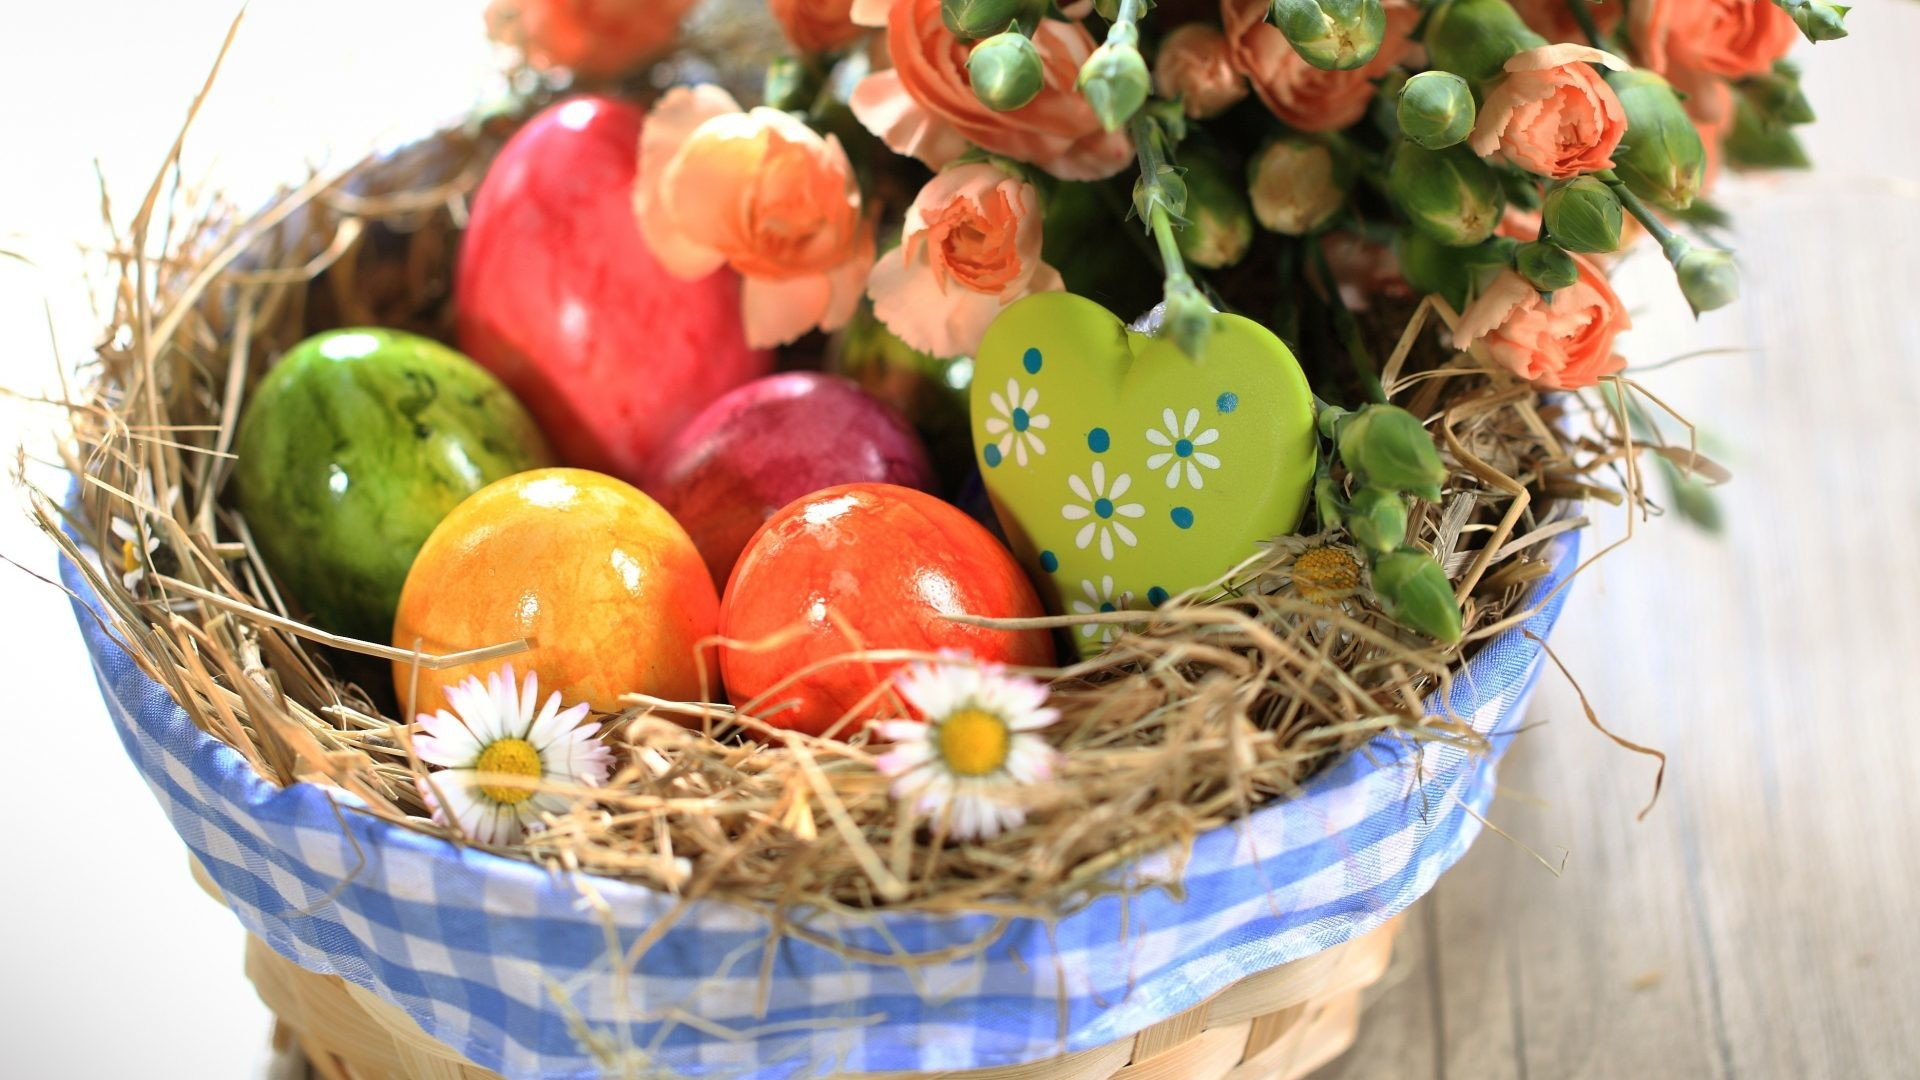 Happy Tag – Happy Life Heart Easter Still Basket Roses Eggs Flowers  Wallpaper Windows 7 Flower